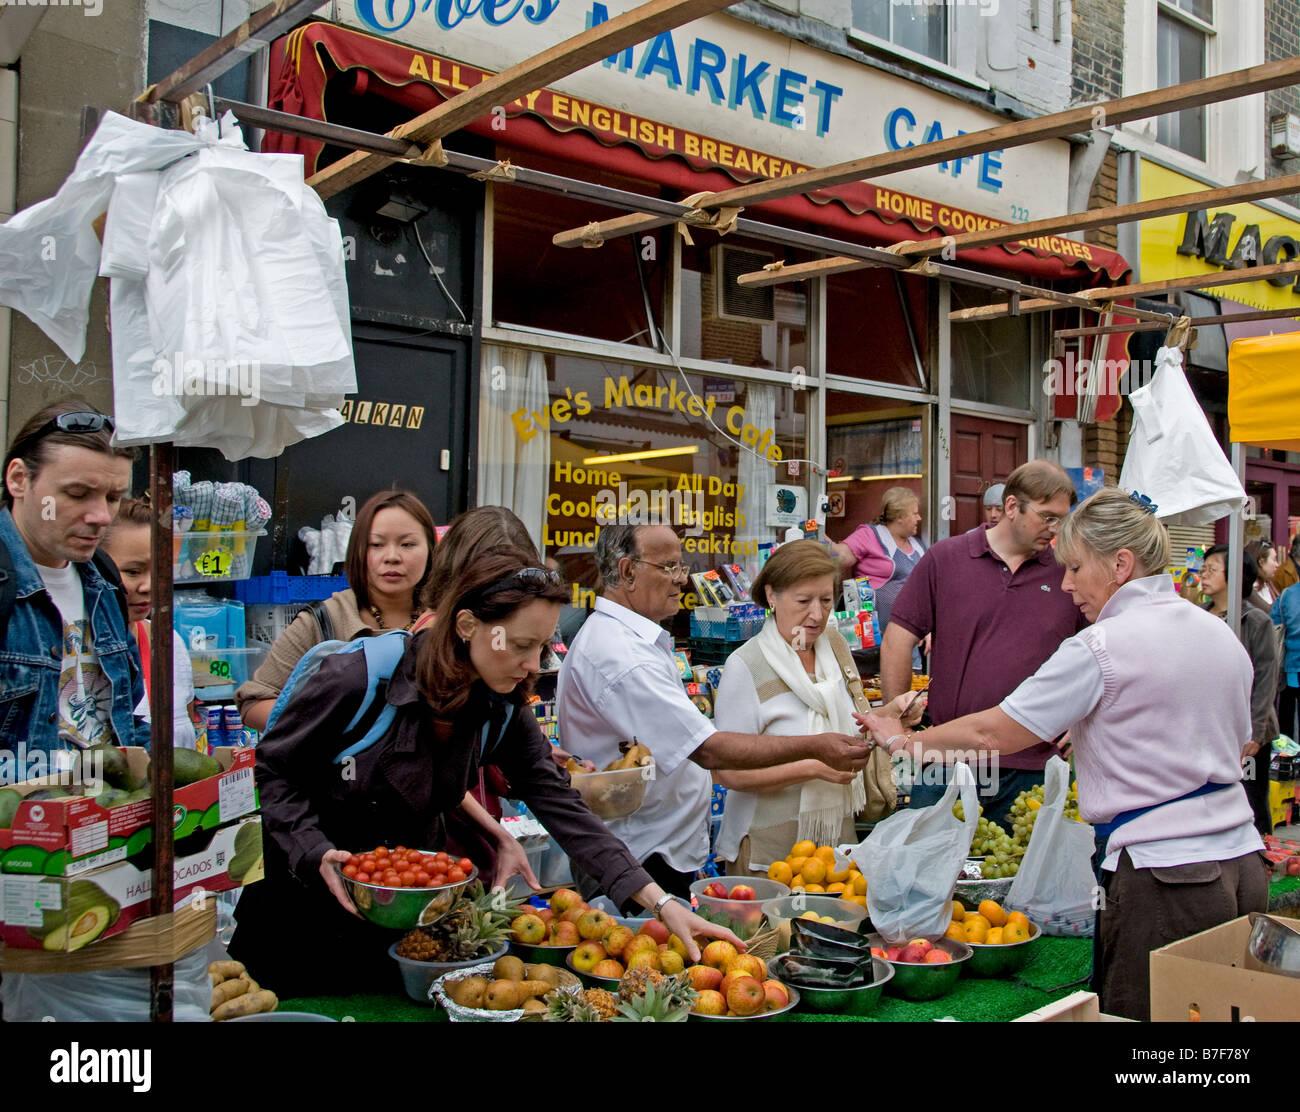 Portobello Road Market Notting Hill Greengrocer - Stock Image